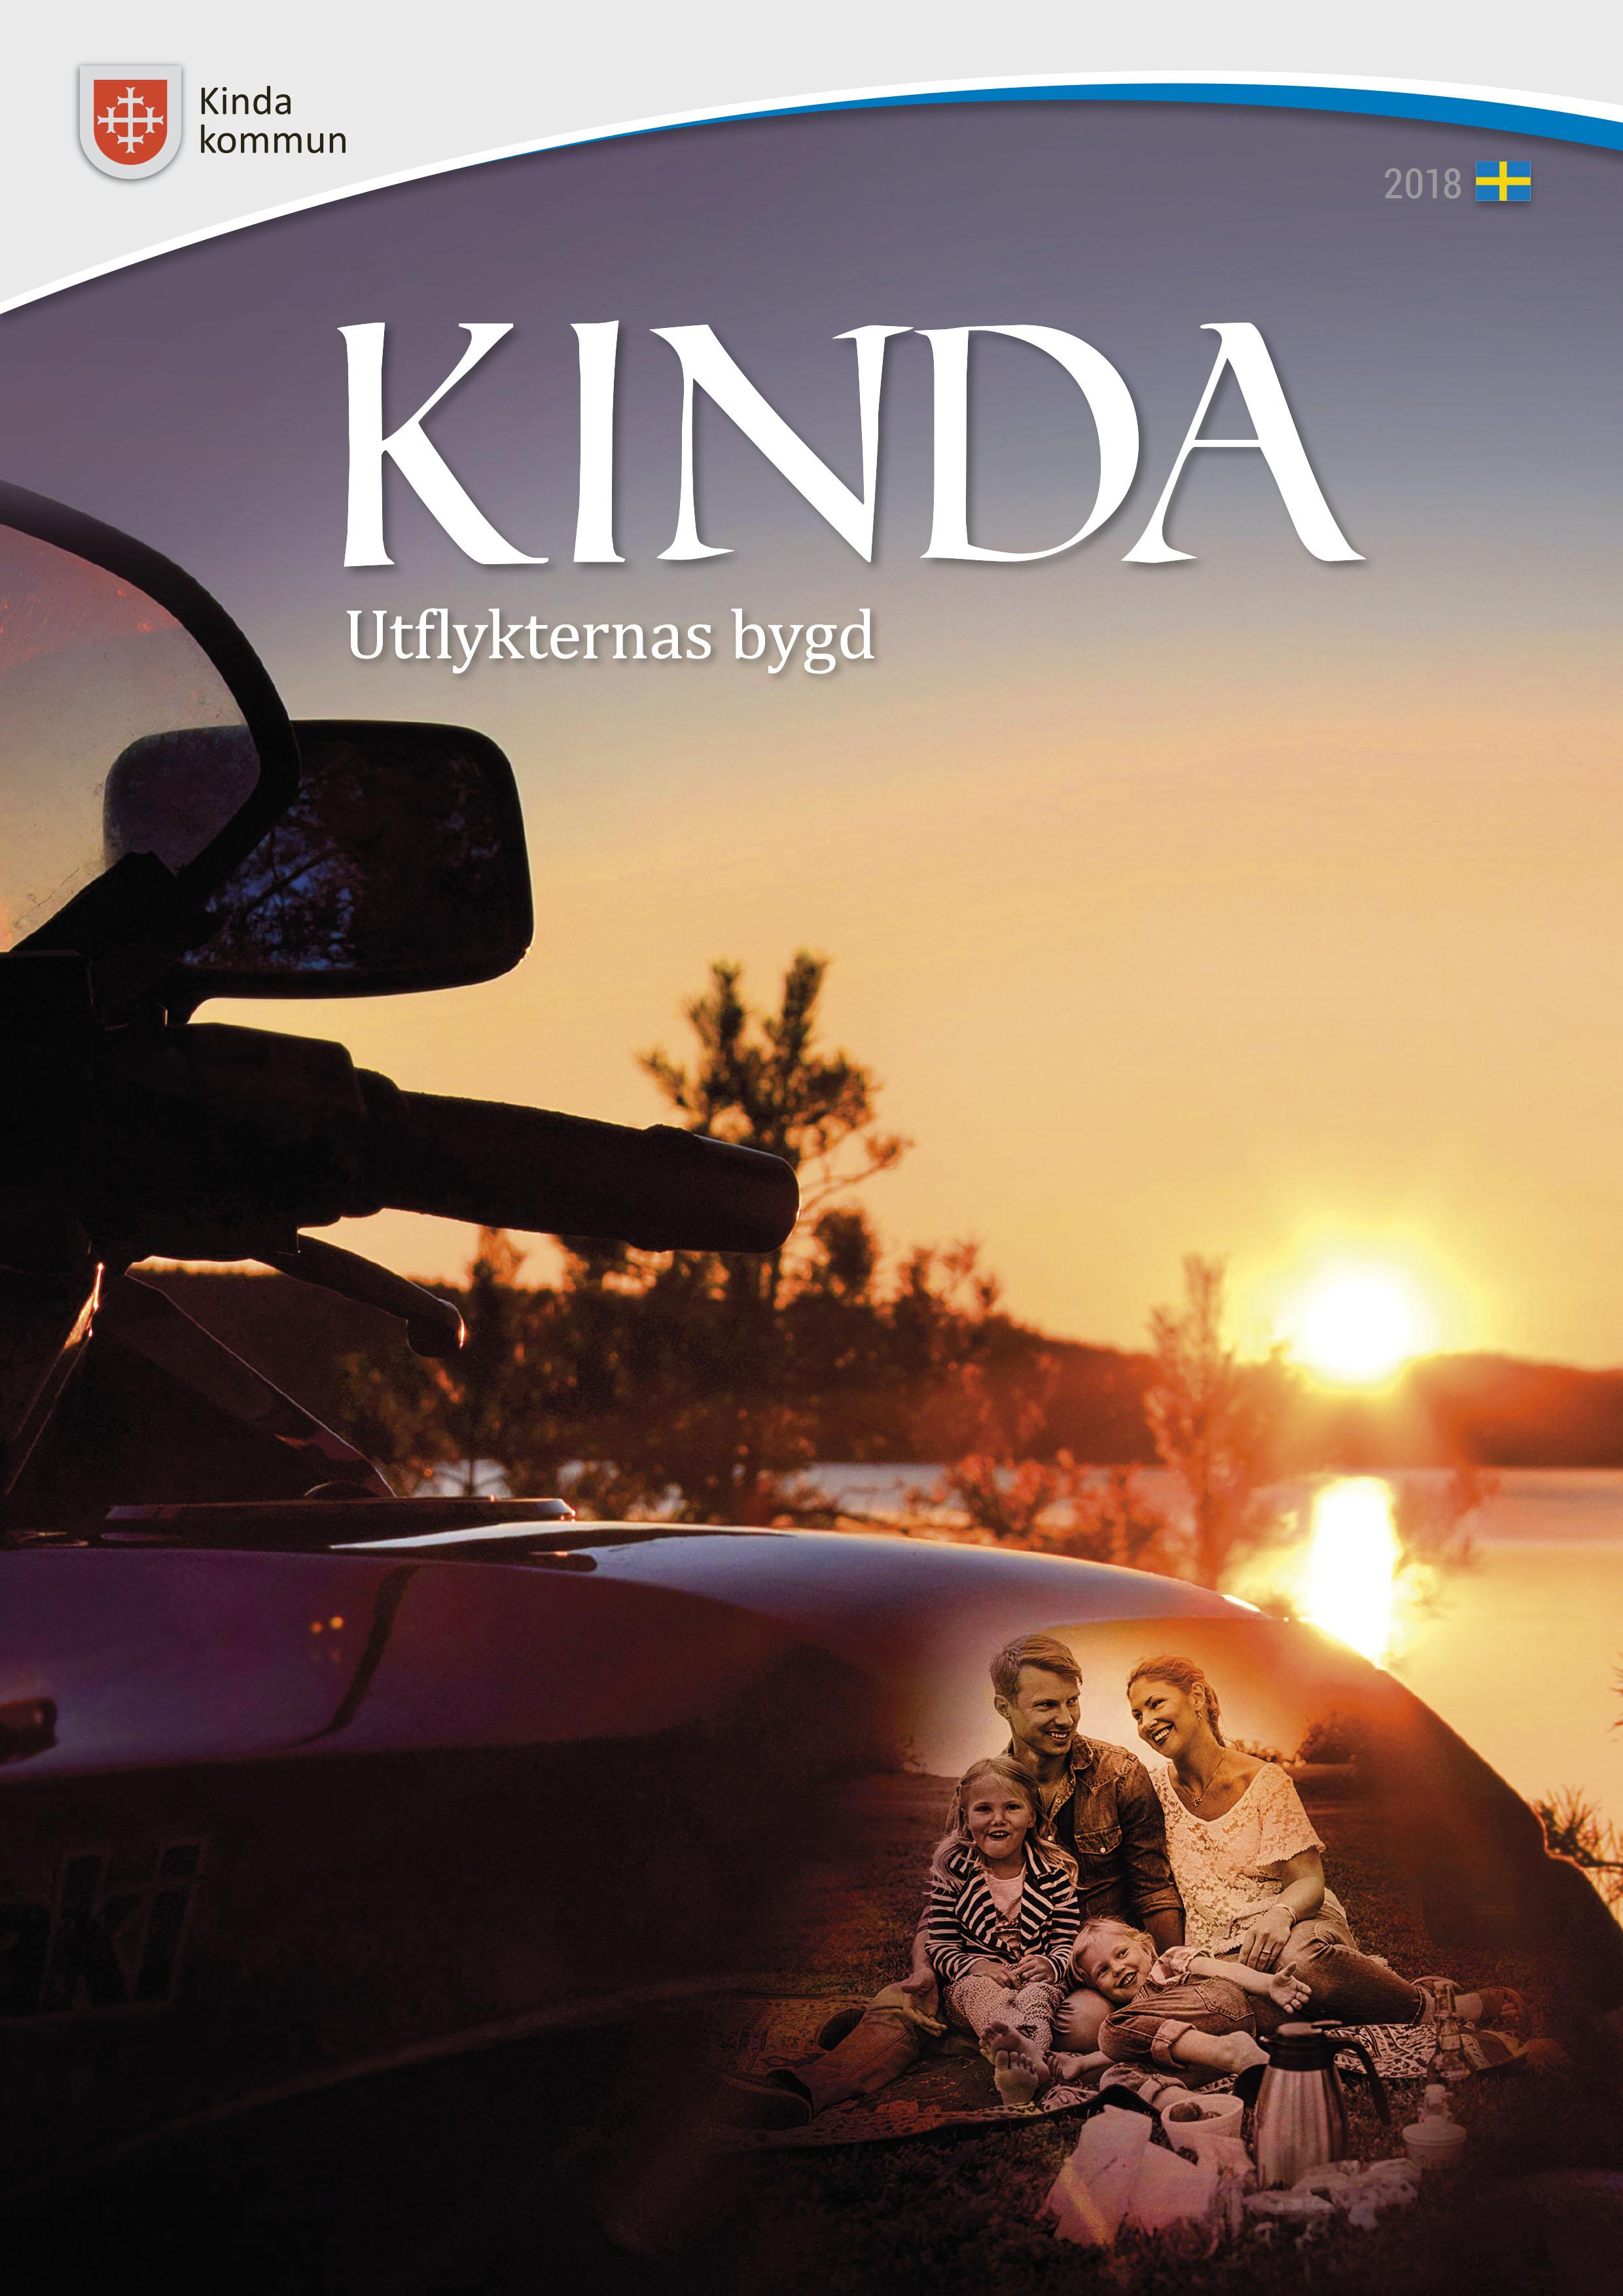 kinda_turistbroschyr_2018_180228_svensk_tryckoriginal.indd